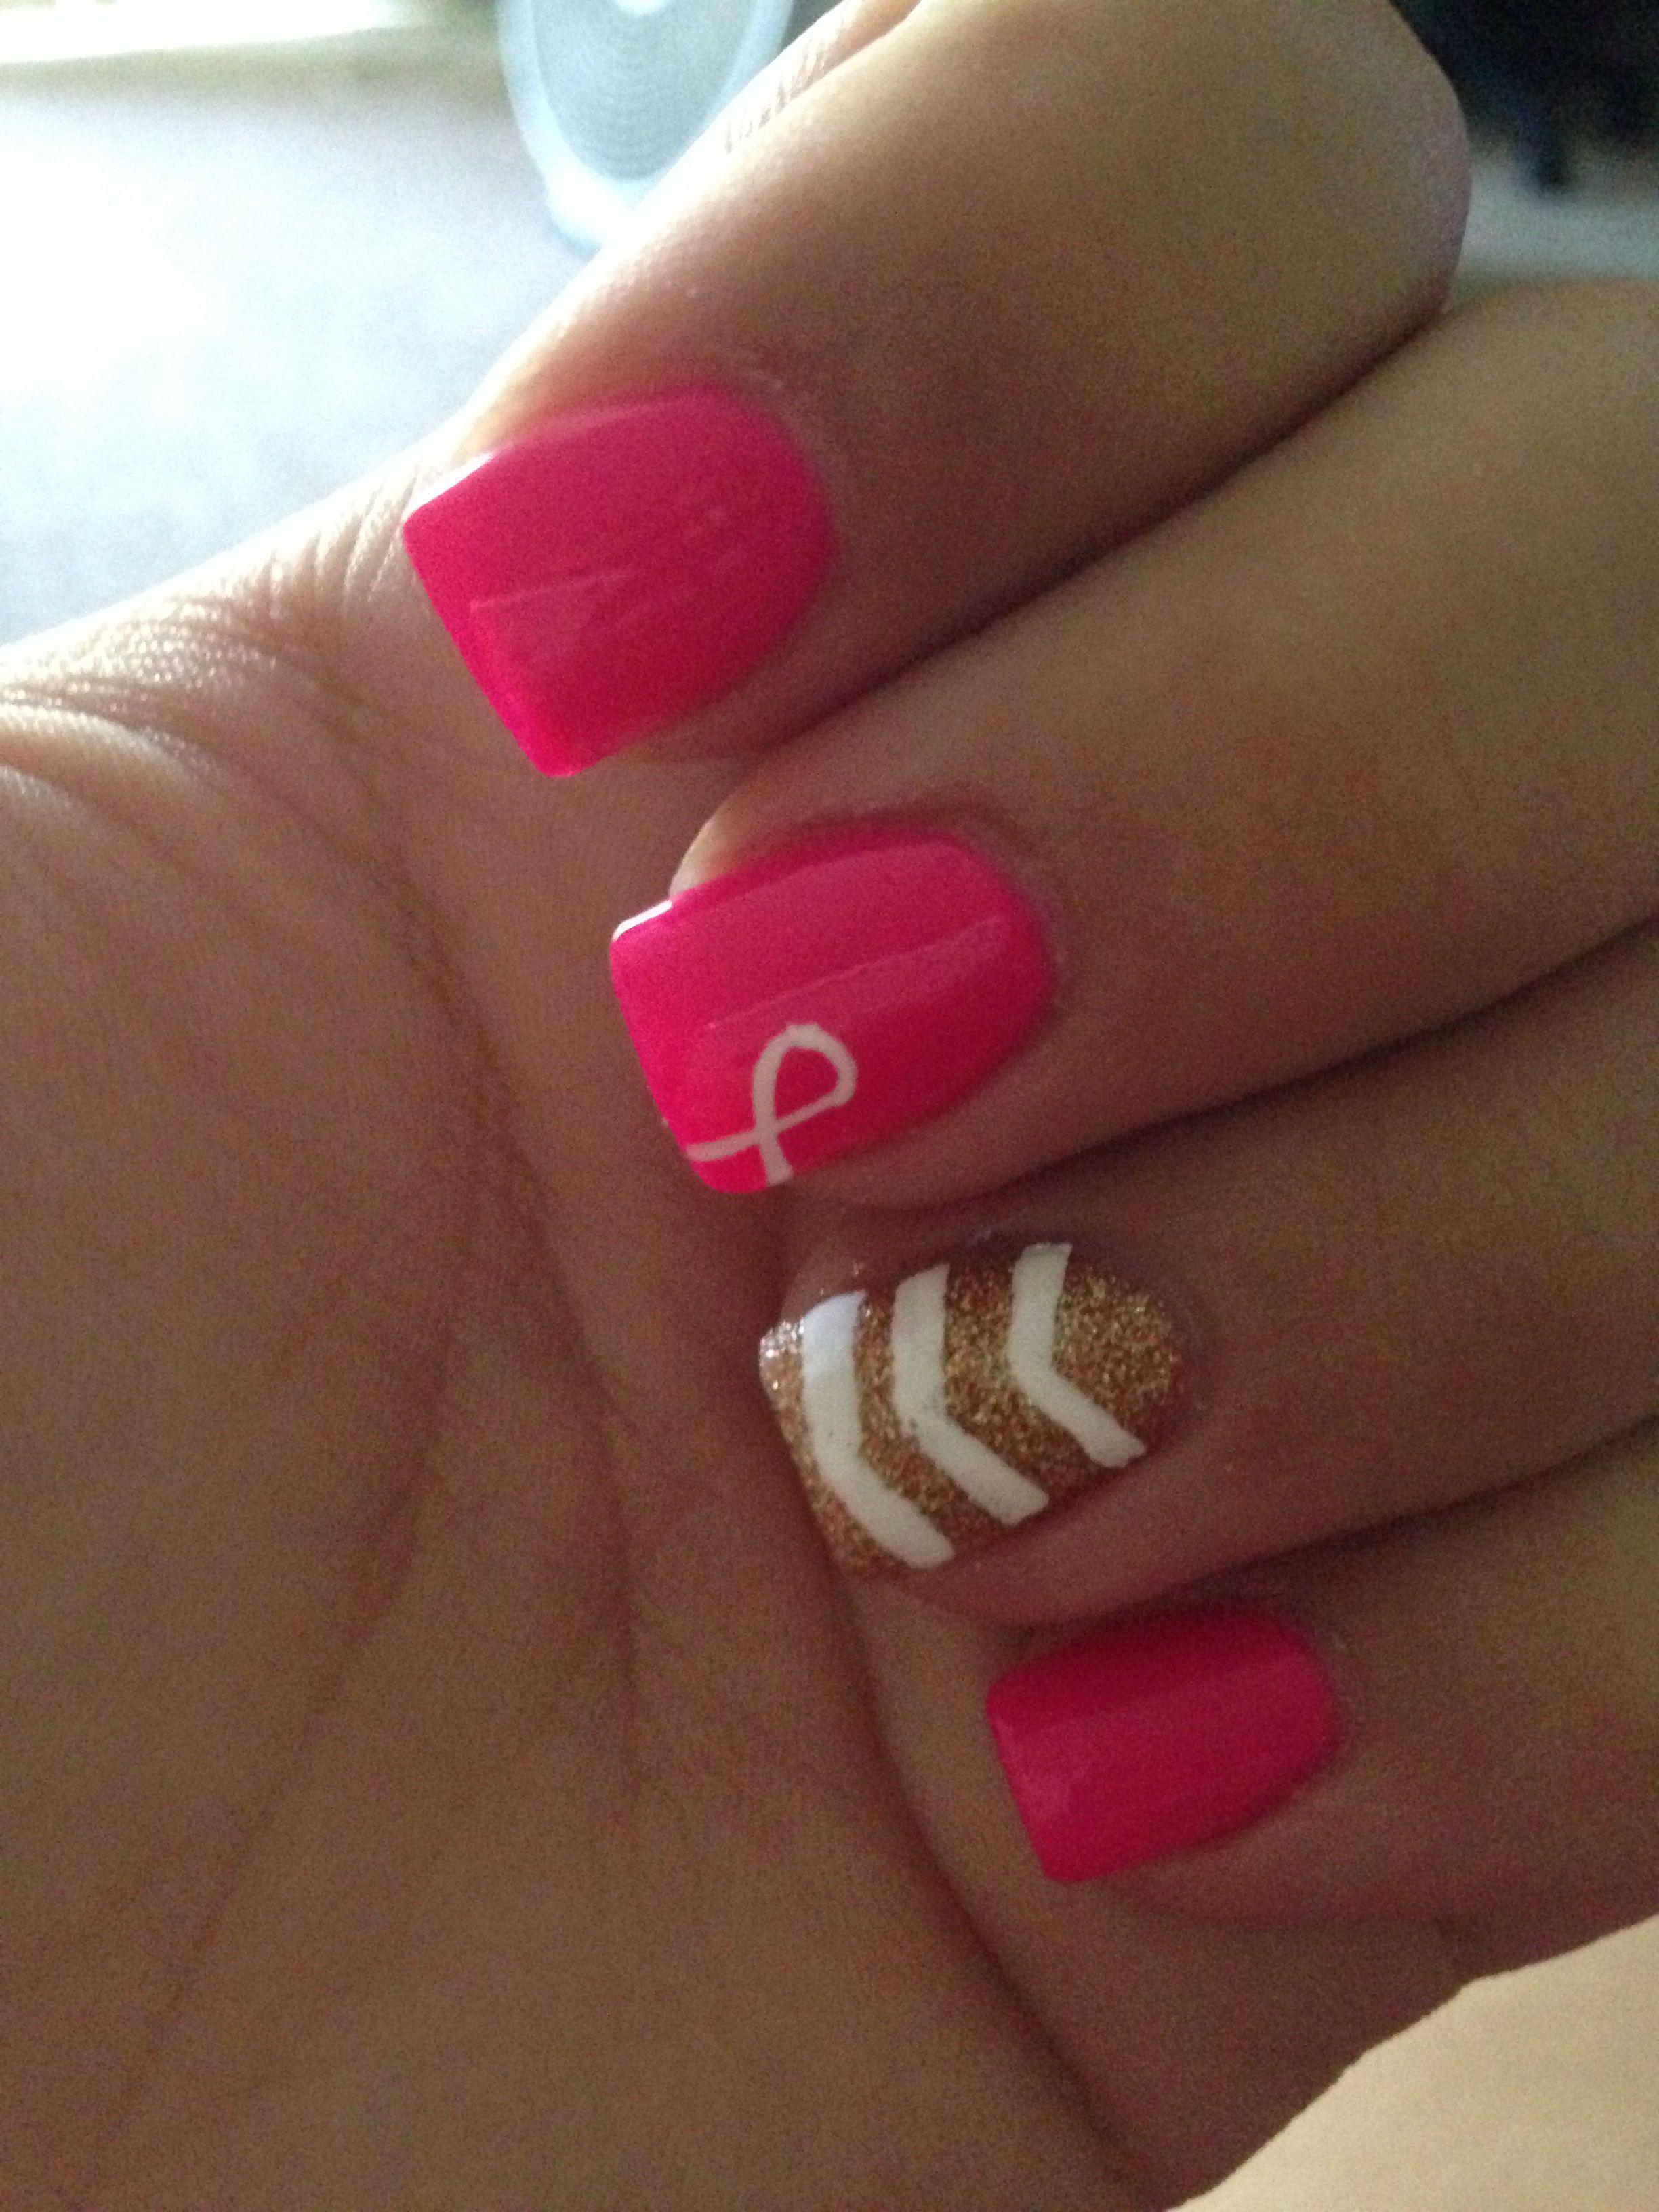 T Cancer Awareness Nails Best I Ve Seen